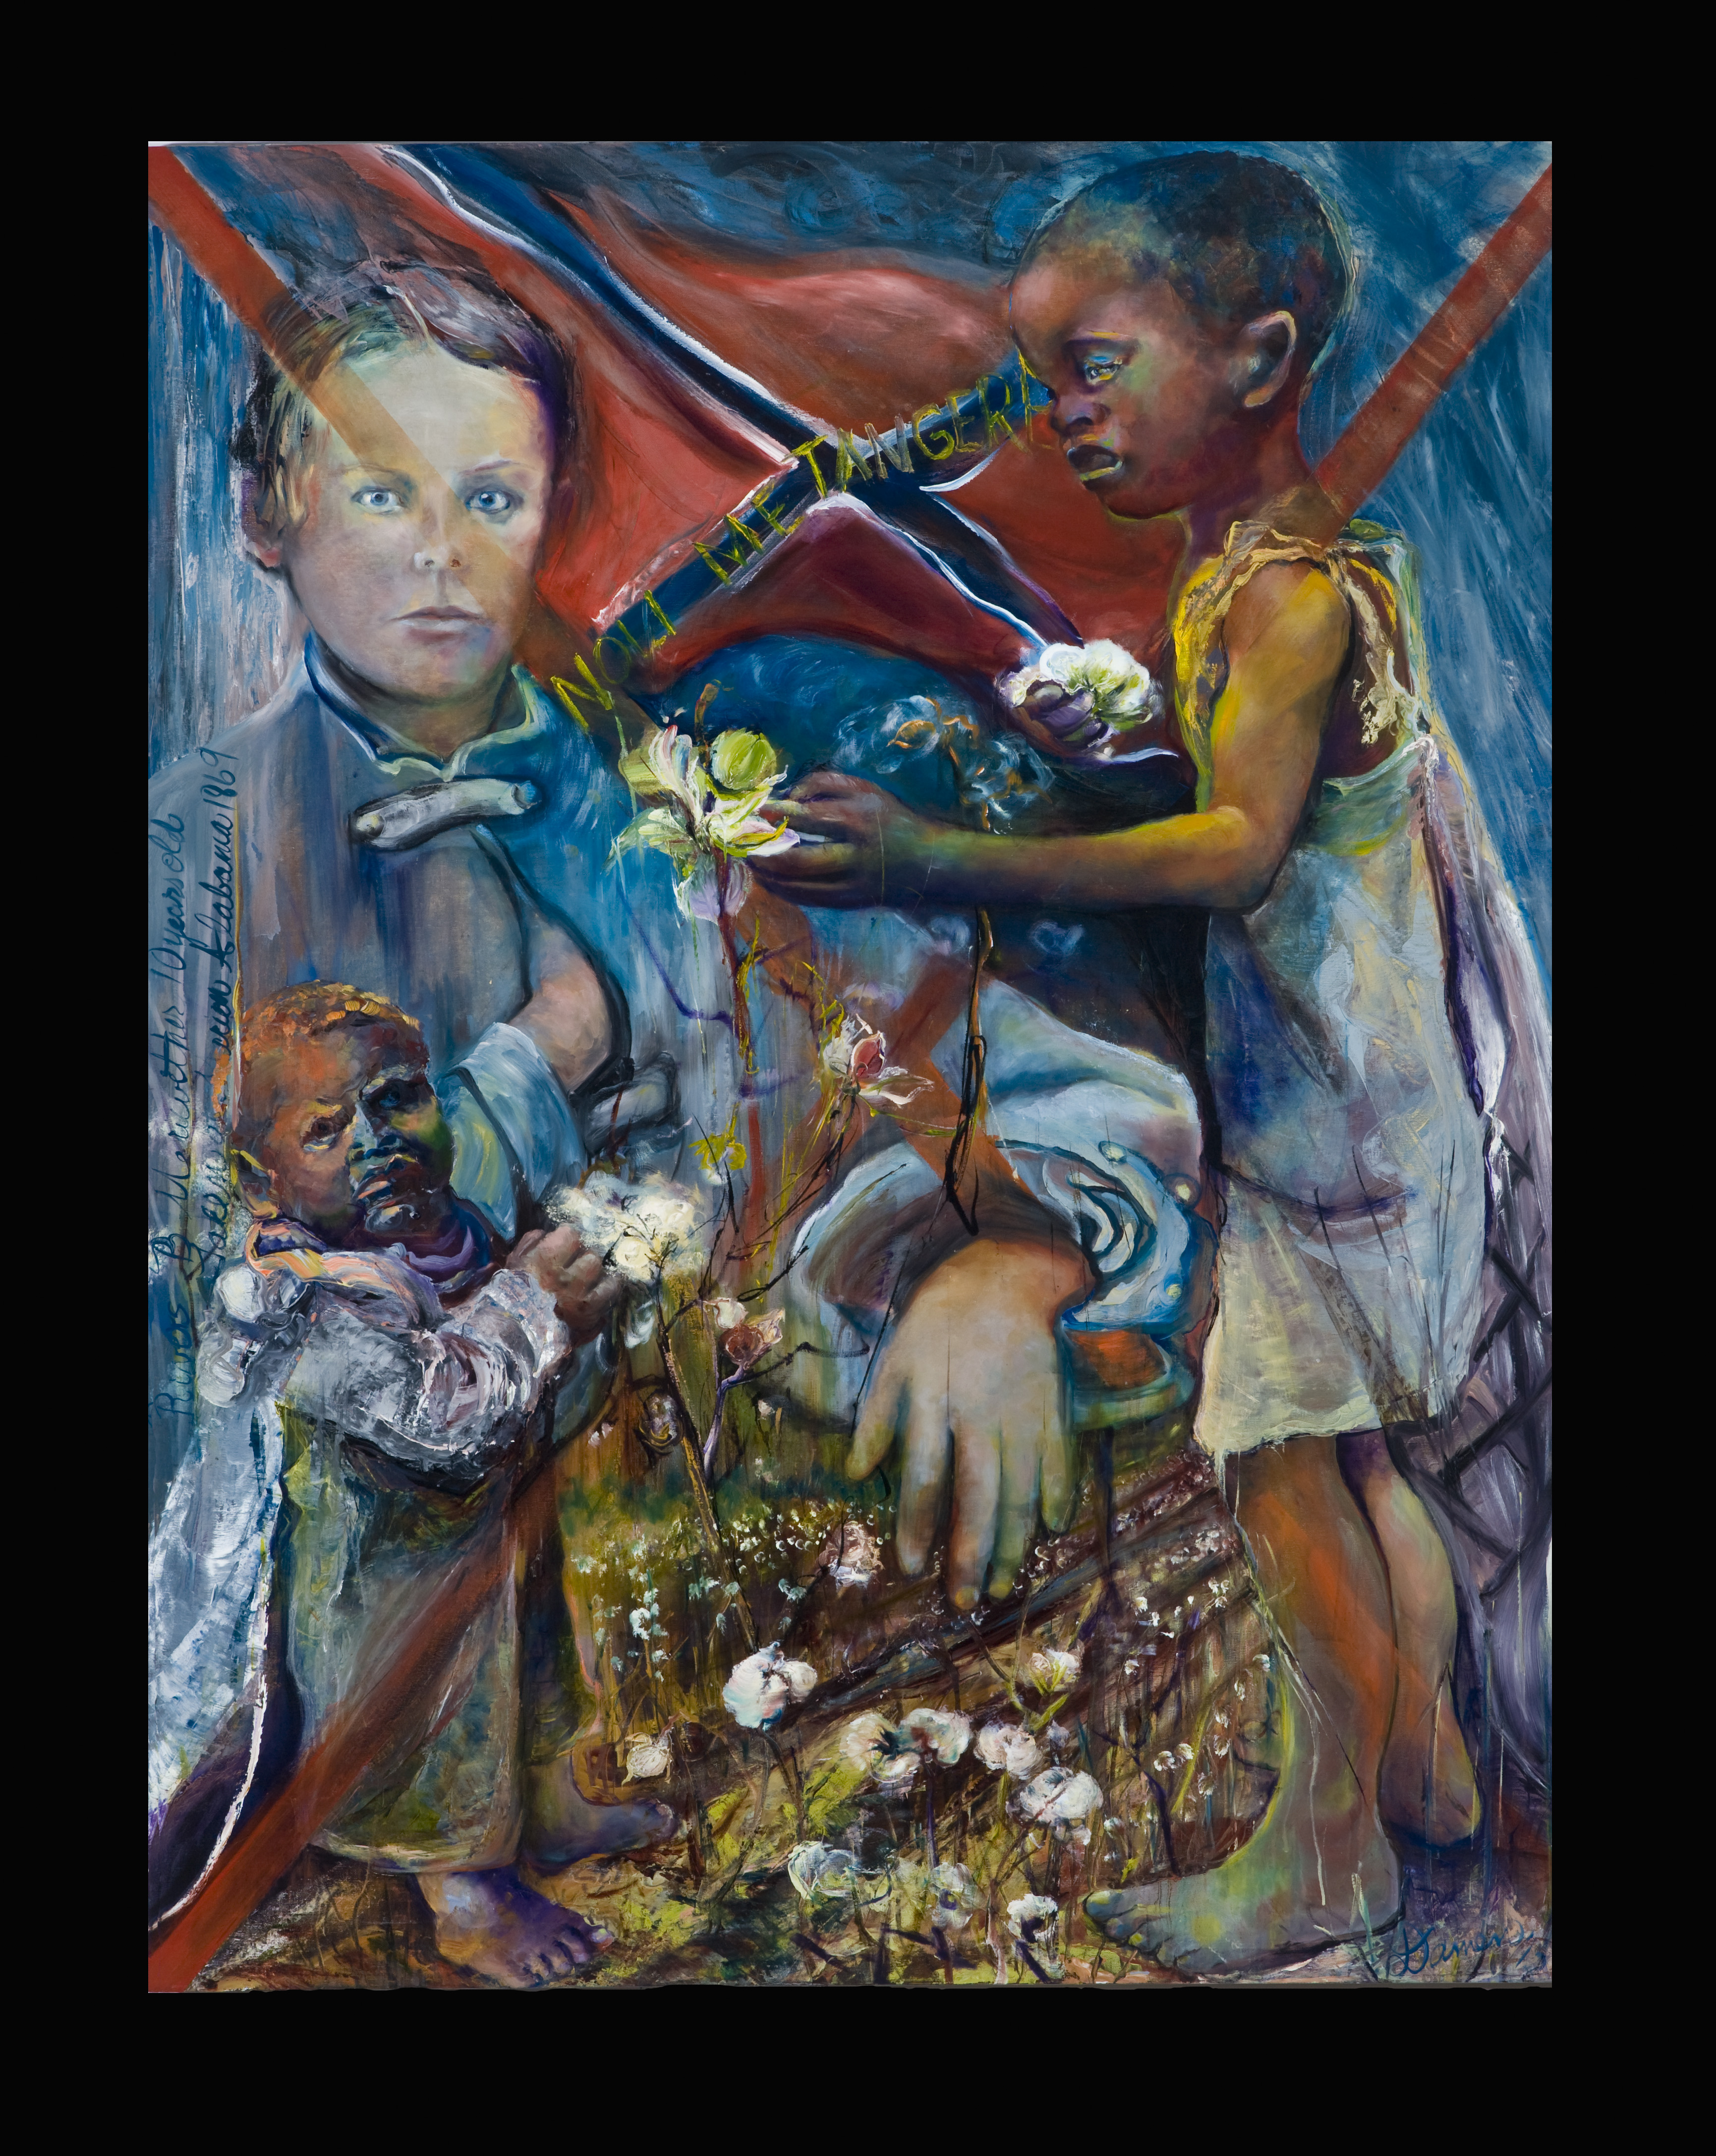 boy soldier, slave children, confederate flag, massacre